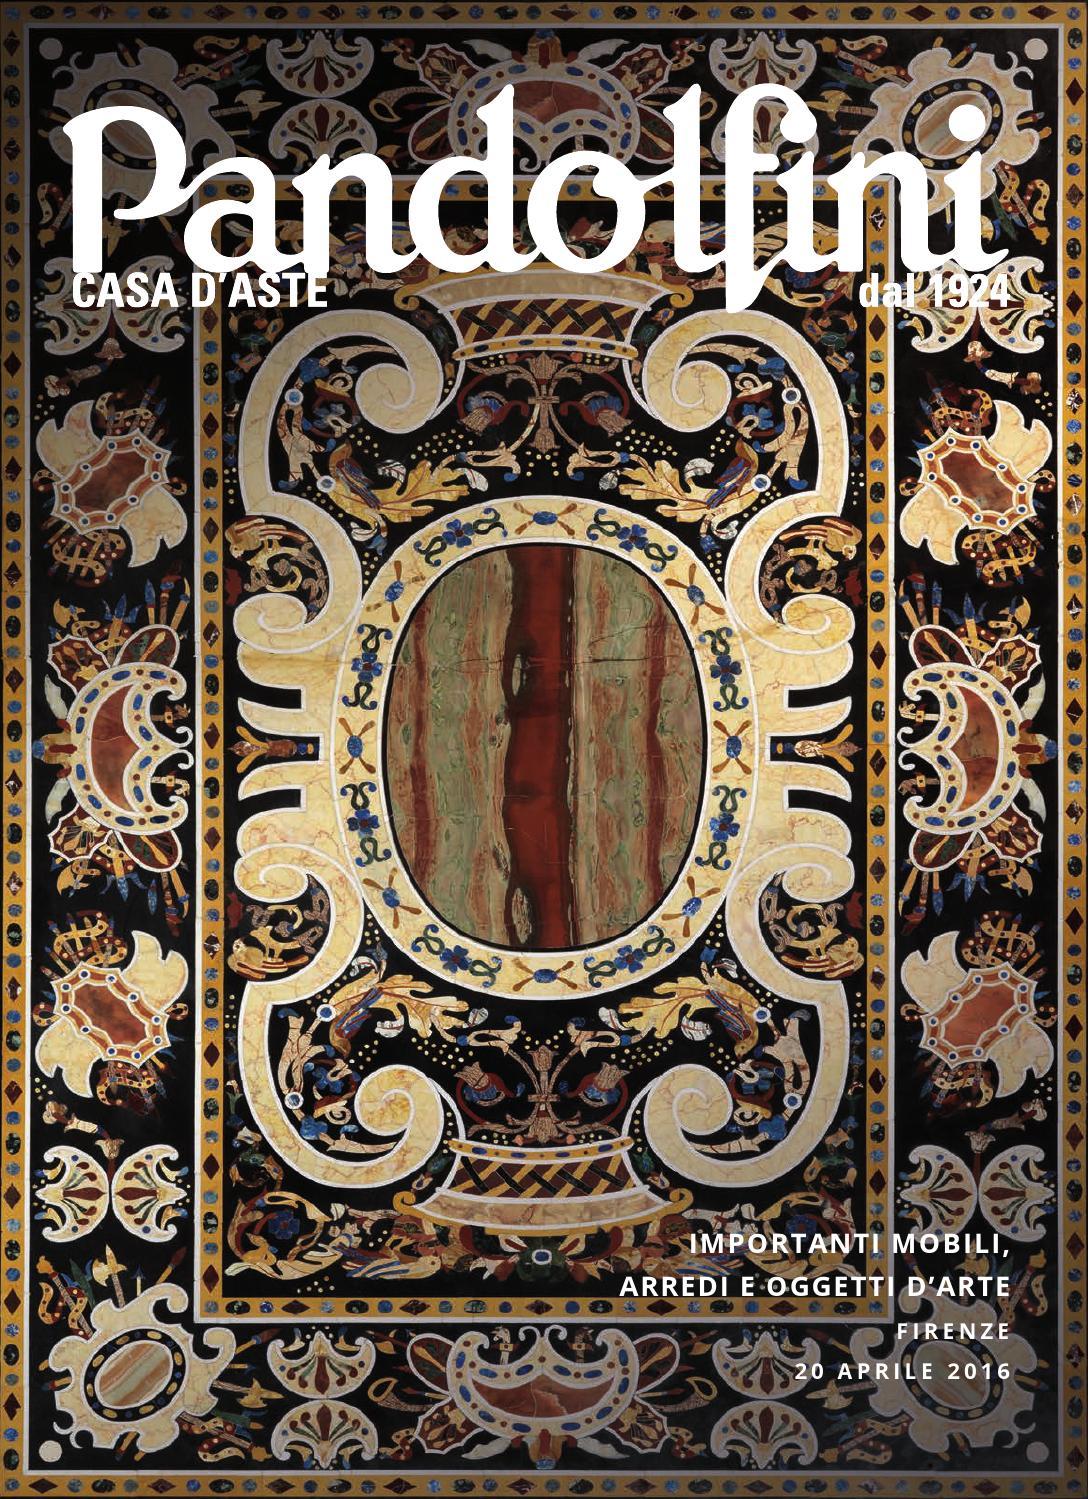 Importanti mobili arredi e oggetti d 39 arte by pandolfini casa d 39 aste issuu - Aste arredamento casa ...